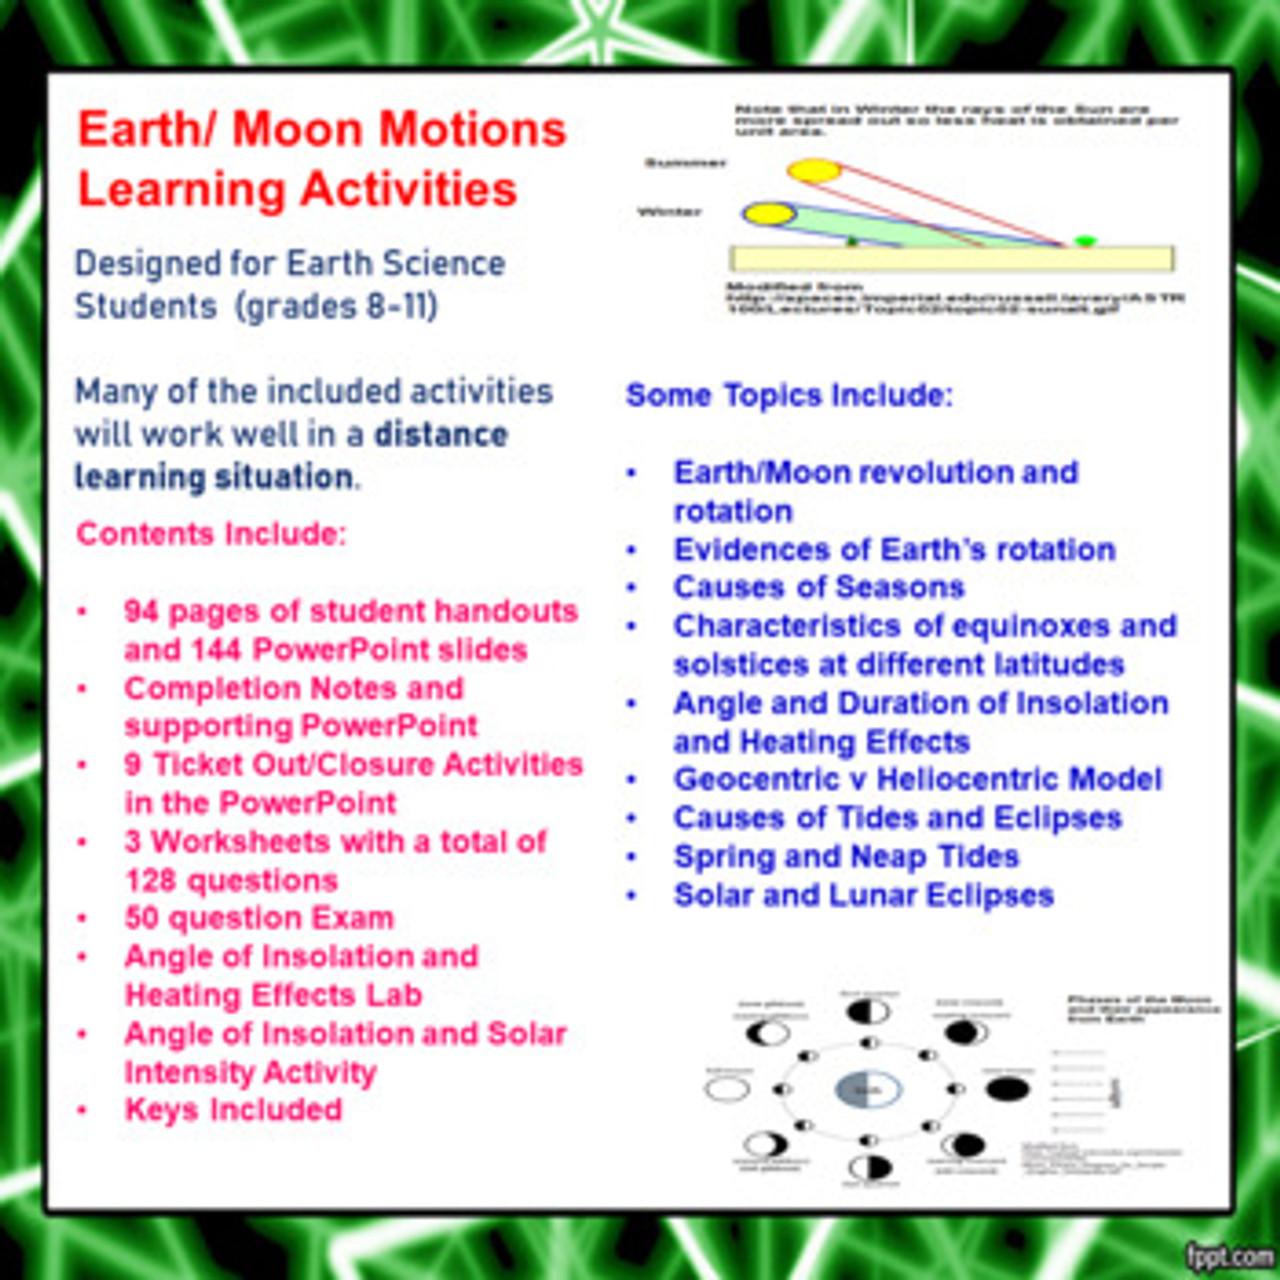 medium resolution of Earth/Moon Motions Learning Activities